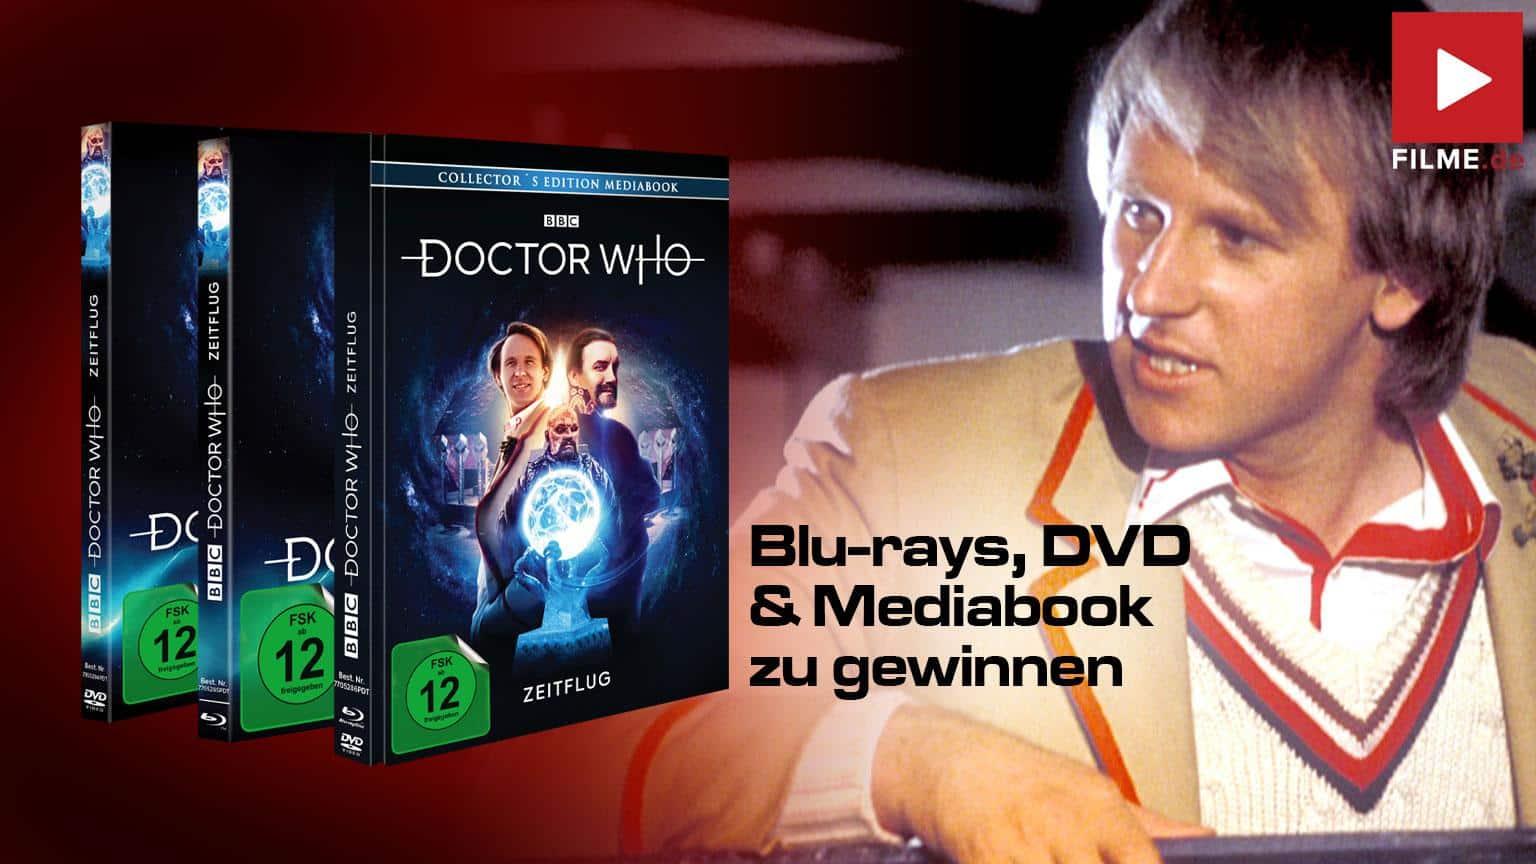 Doctor Who - Fünfter Doktor – Zeitflug Mediabook Shop kaufen Gewinnspiel gewinnen